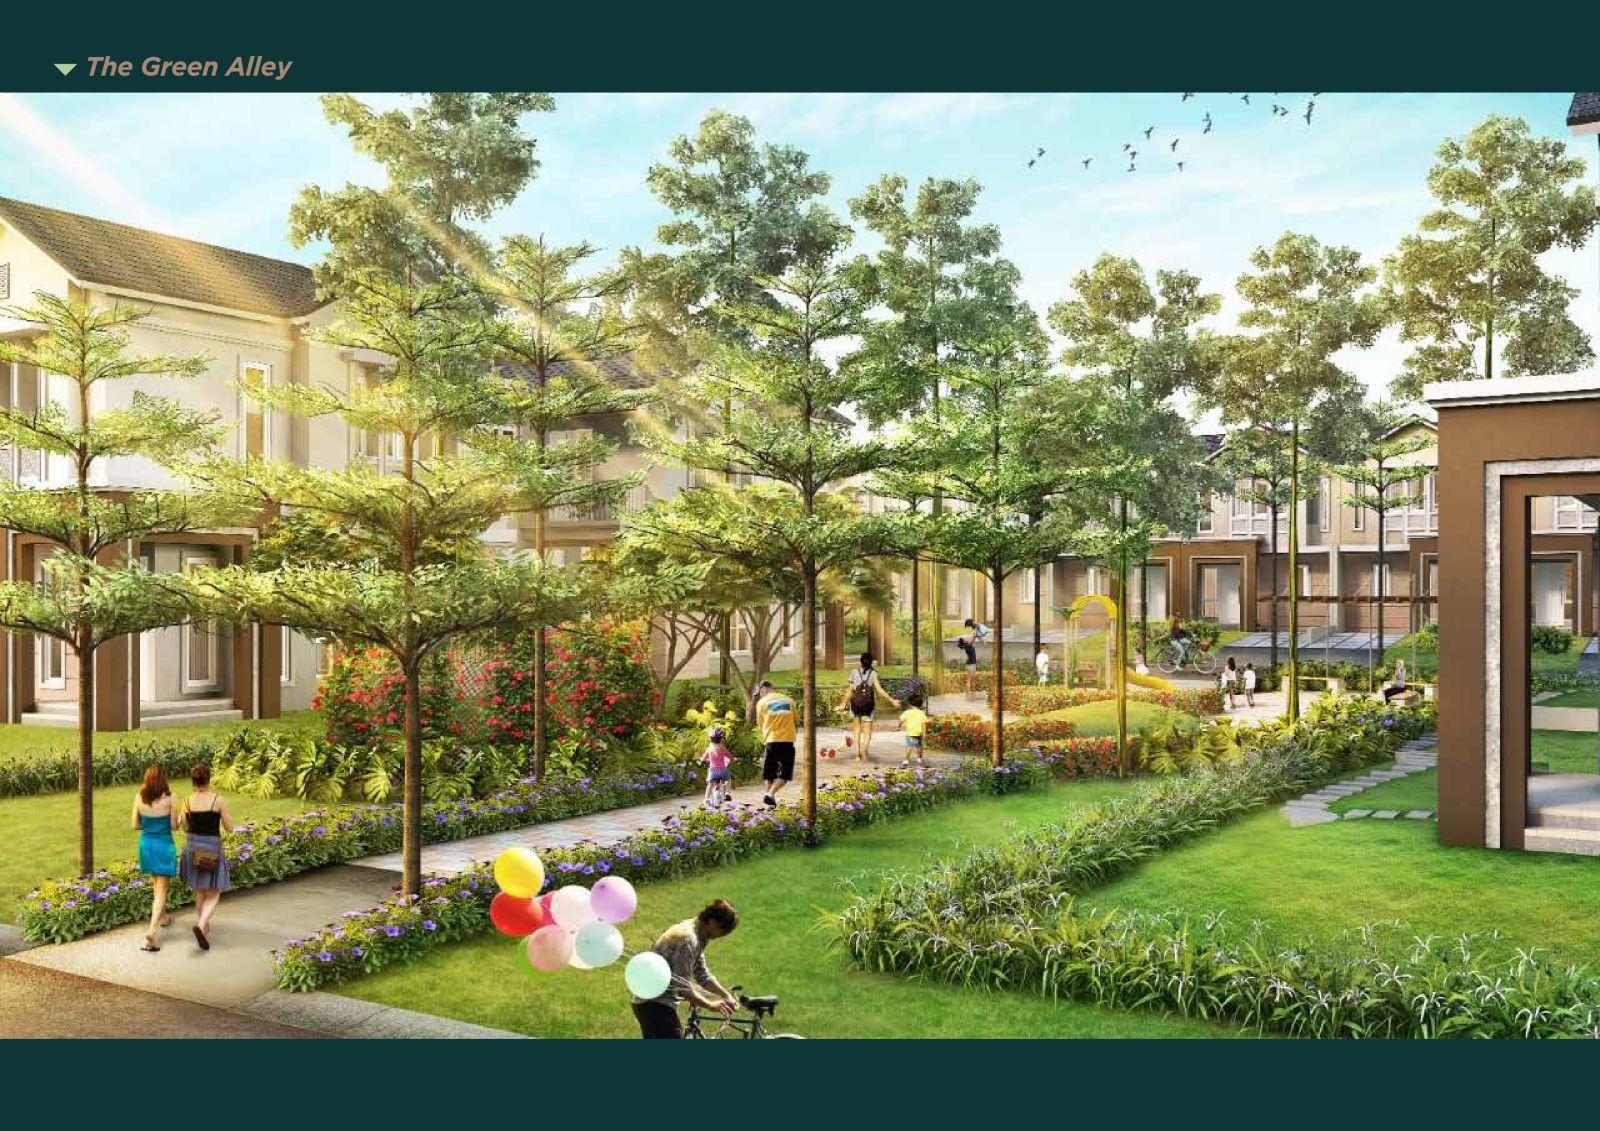 Ayodhya-Garden-2-12